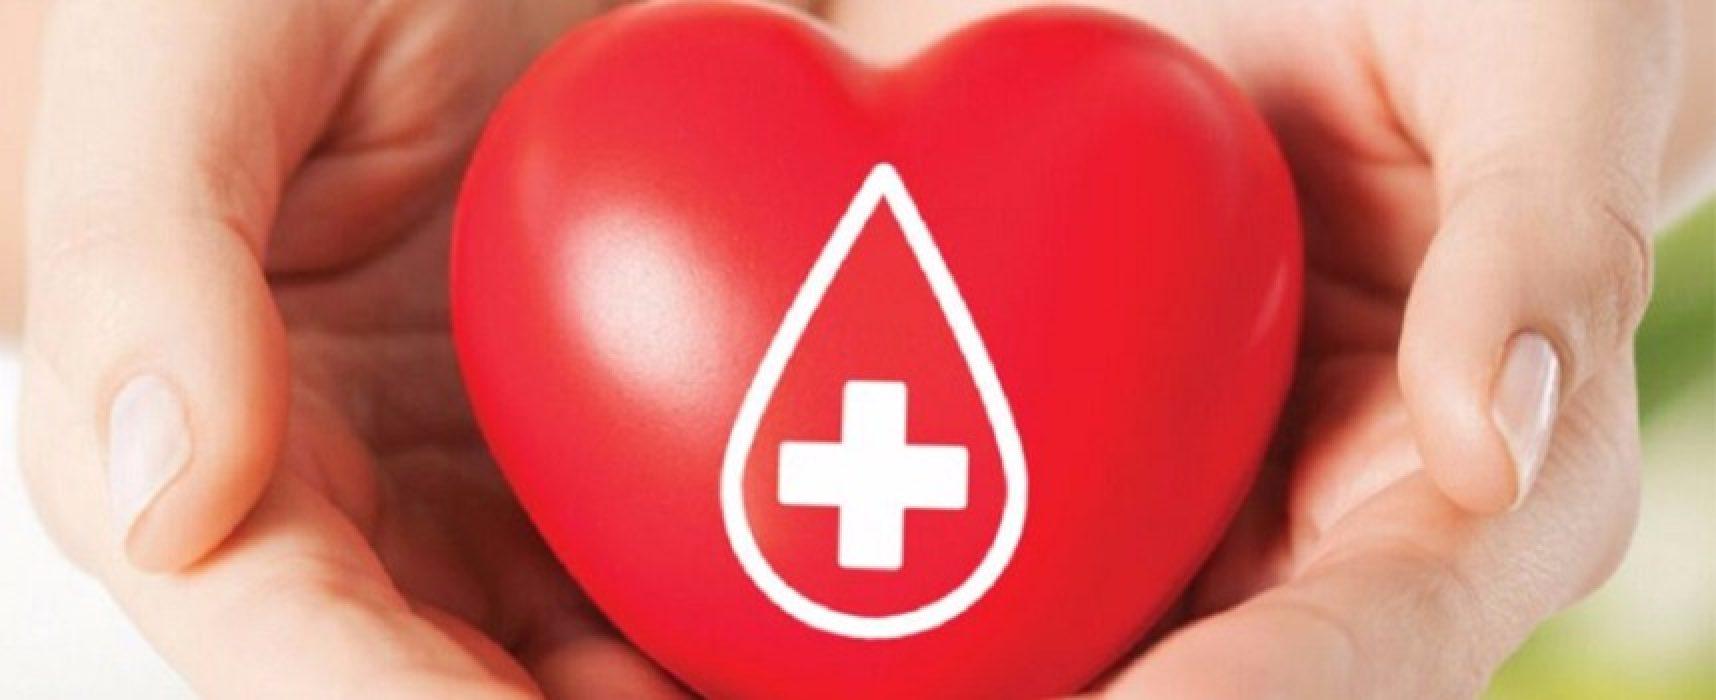 """Fratres"" organizza a Bisceglie una raccolta straordinaria di sangue"